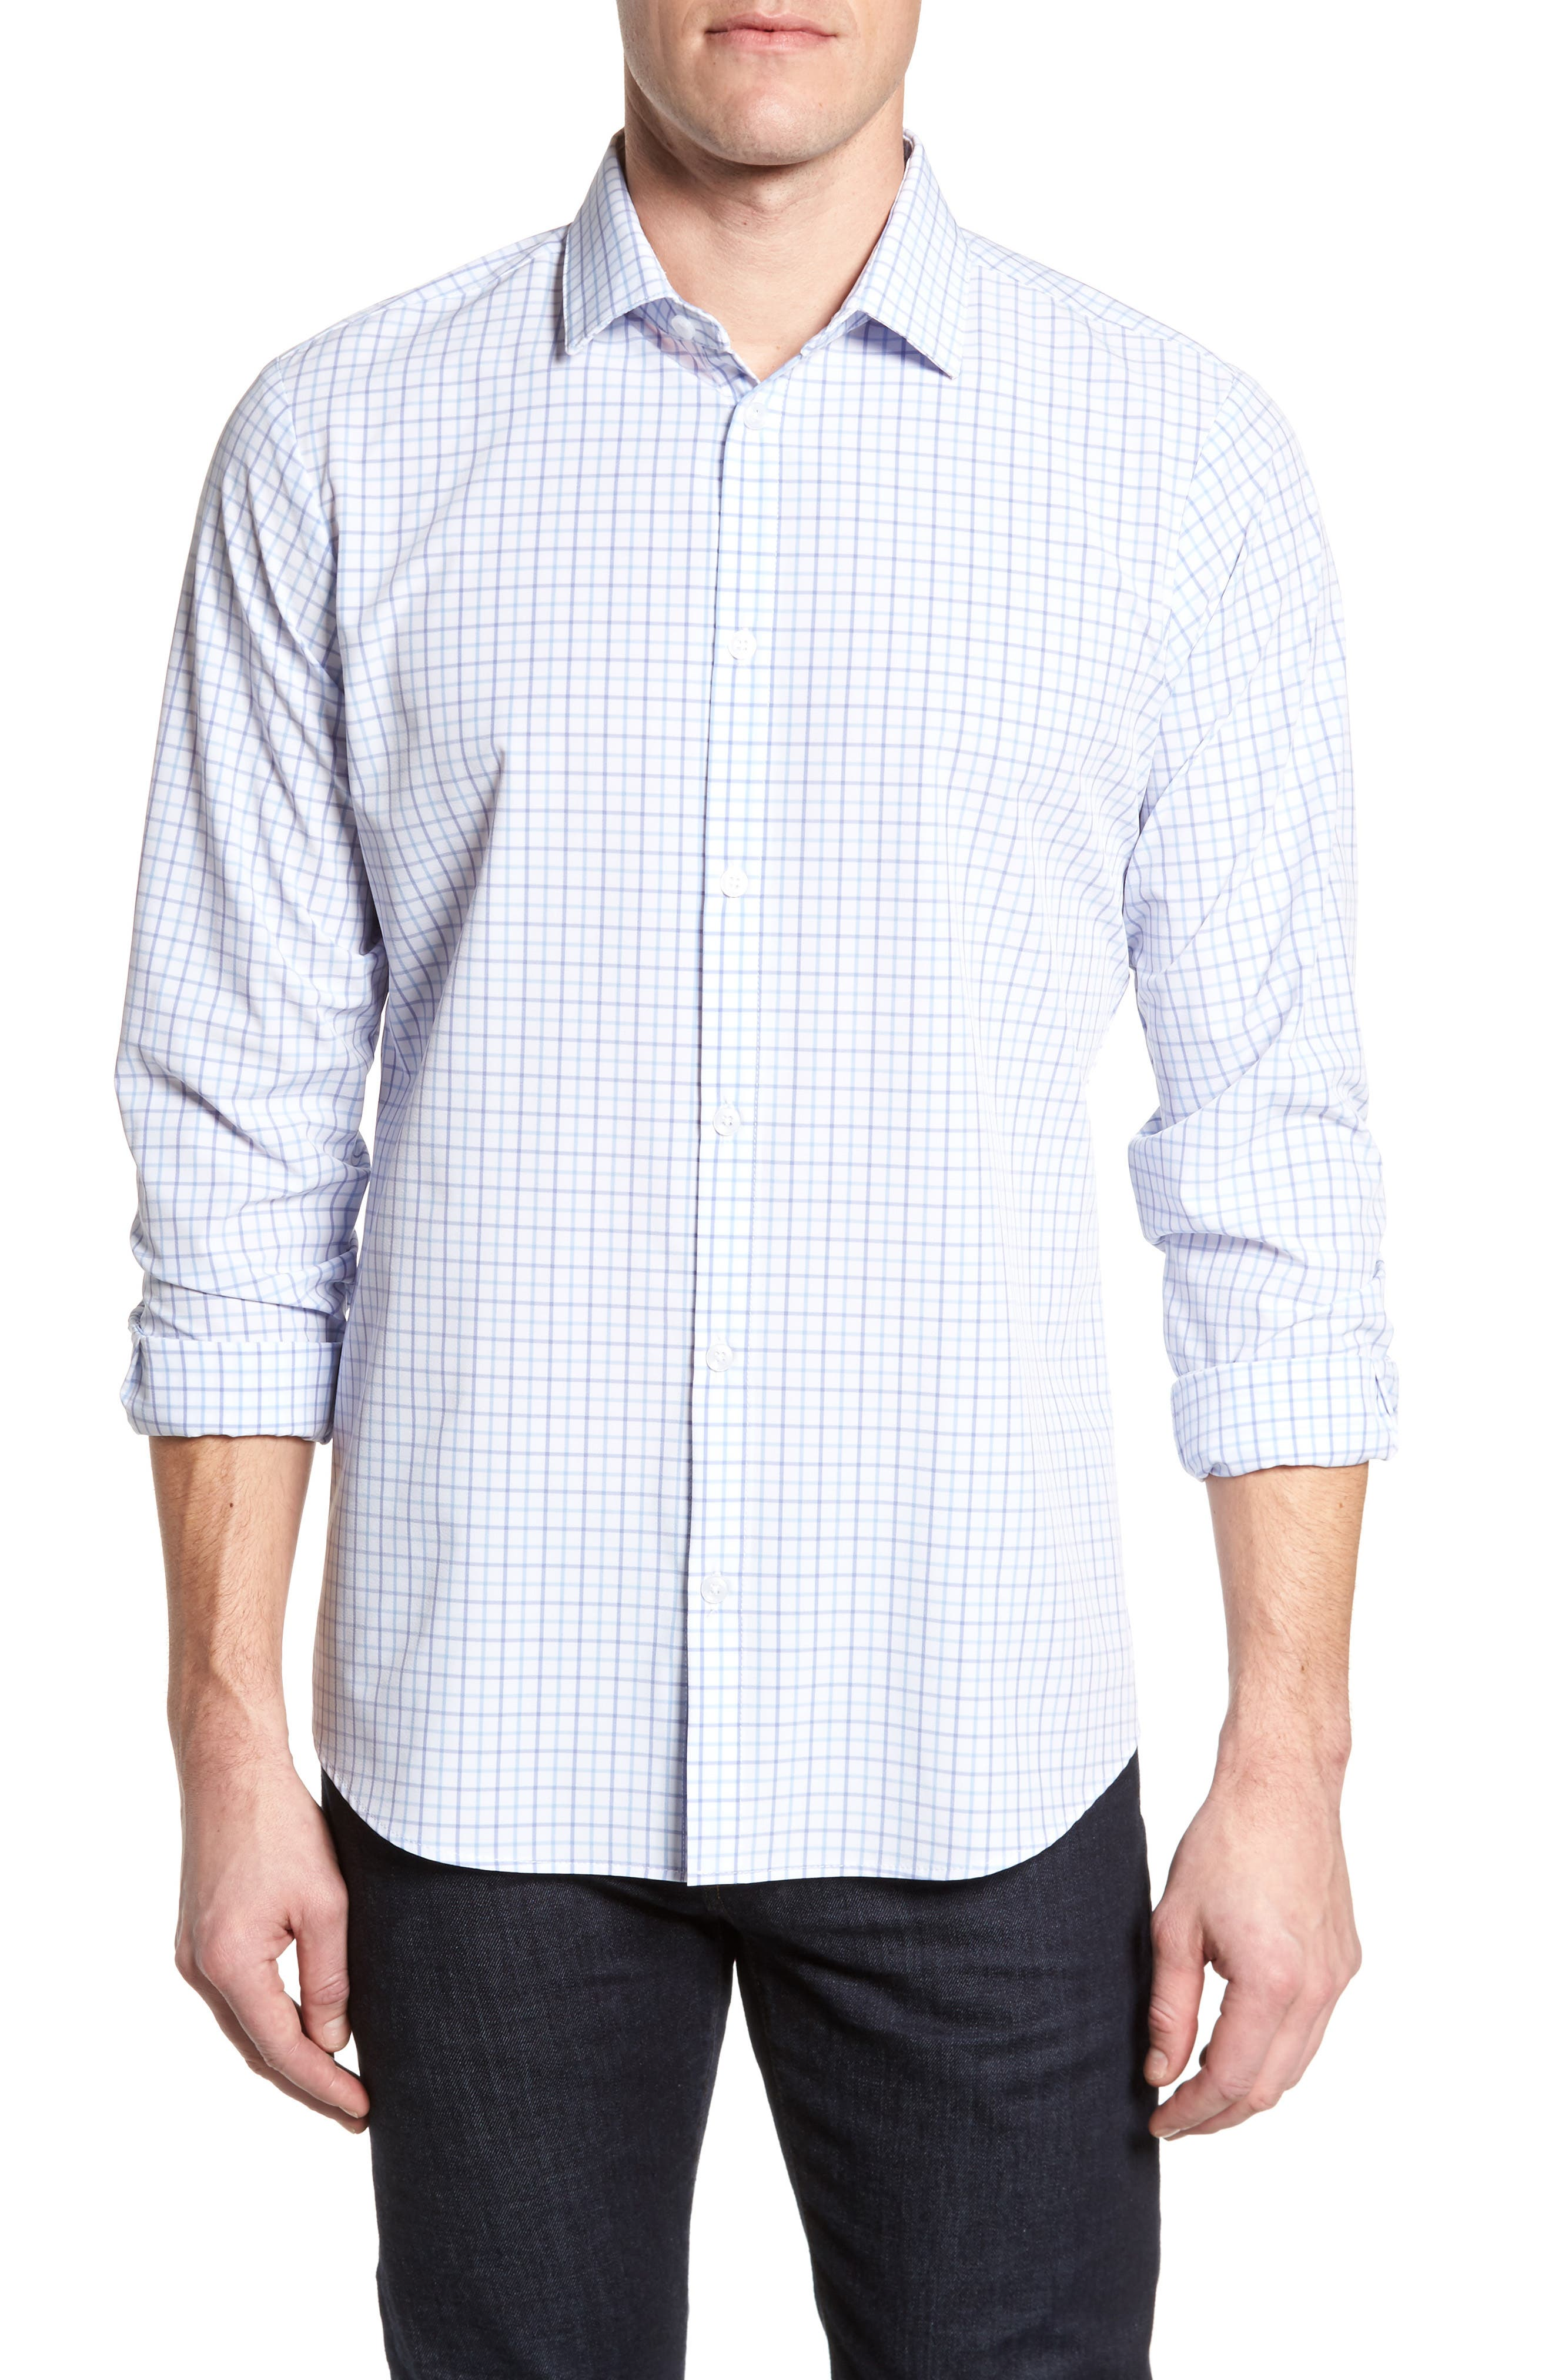 Hallandale Dusty Lavender Check Sport Shirt,                             Main thumbnail 1, color,                             White